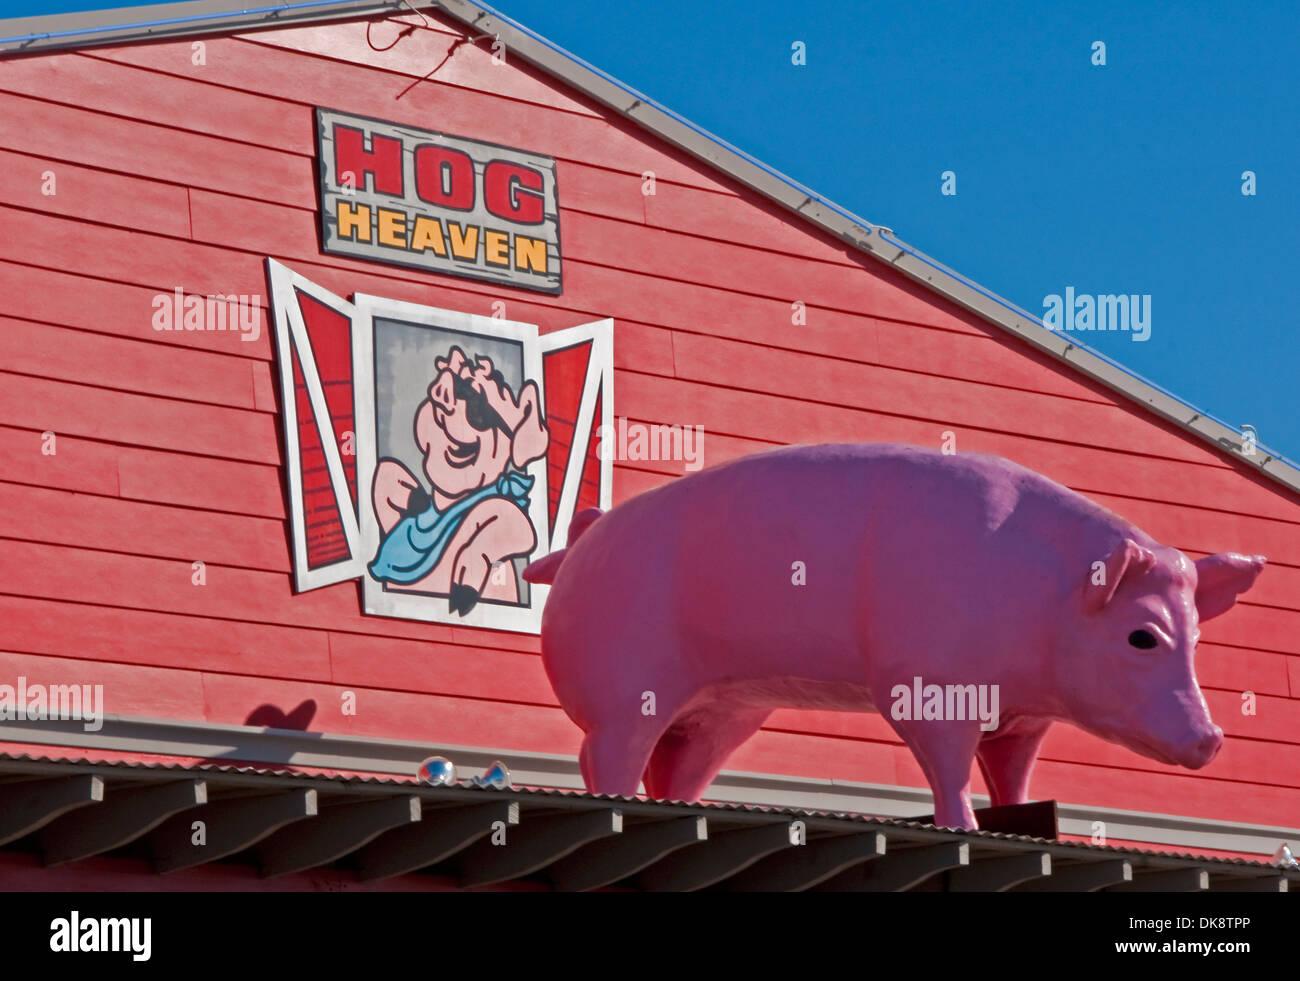 Hog Heaven restaurant sign at Biloxi on Mississippi Gulf Coast. - Stock Image